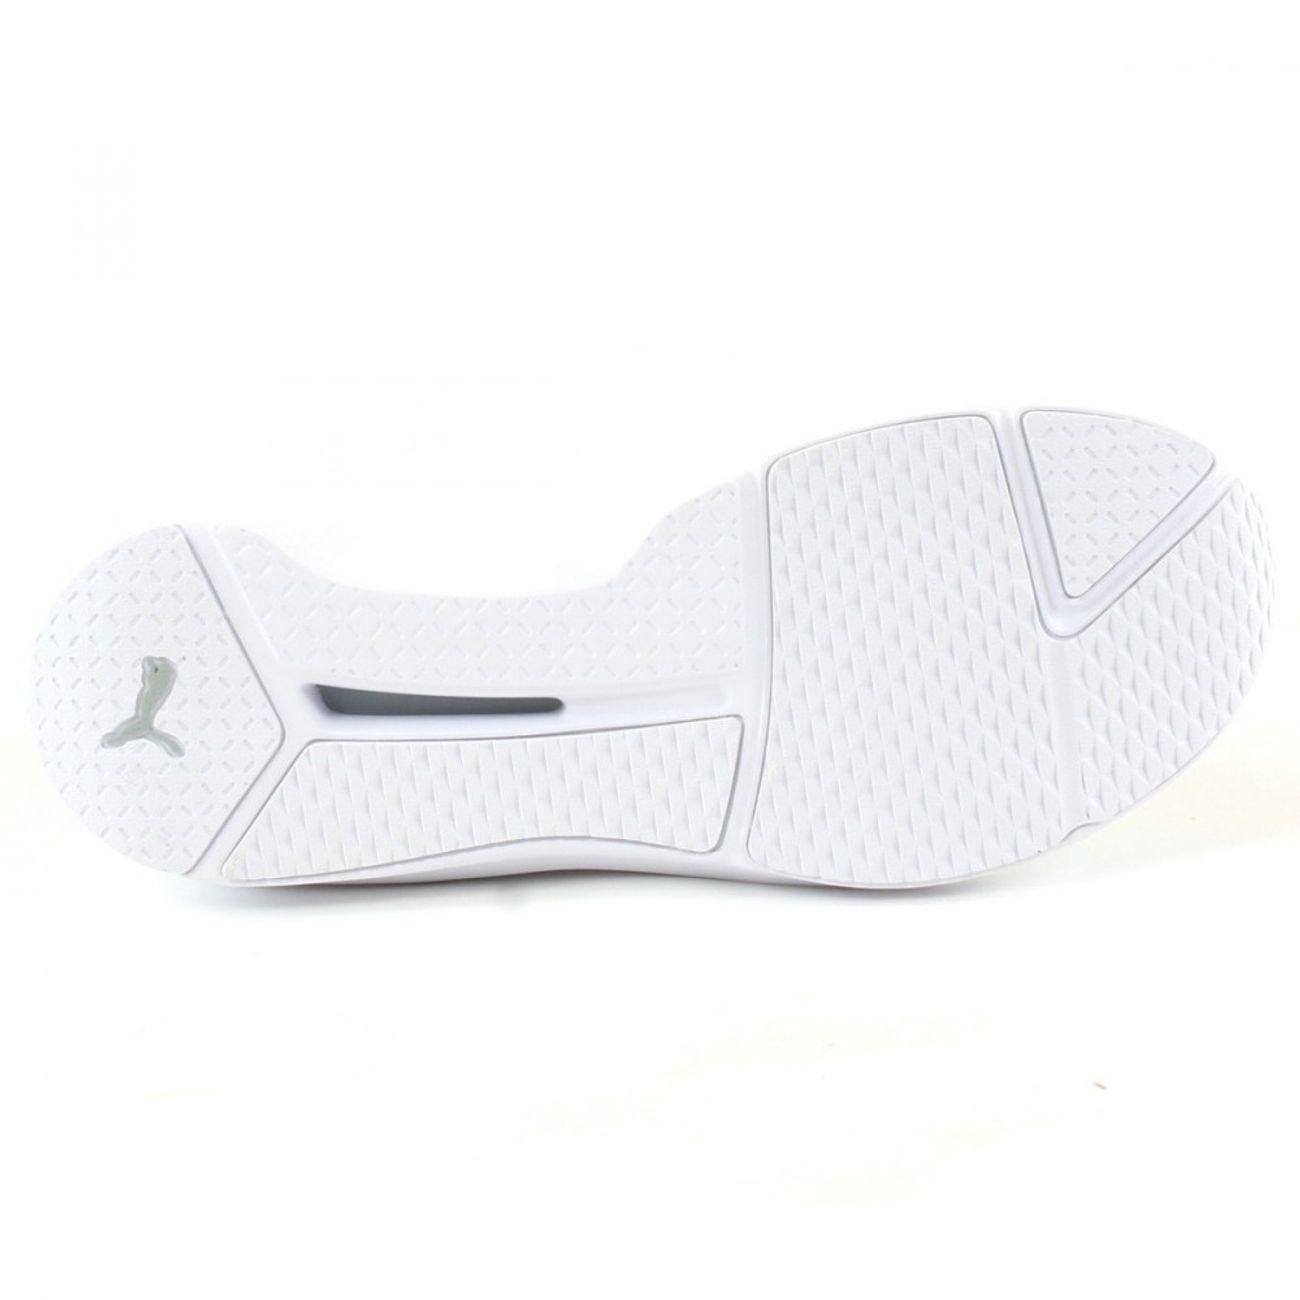 6d442bebe37f ... Mode- Lifestyle femme PUMA Chaussures de Fitness Puma Fierce Swan Blanc  ...